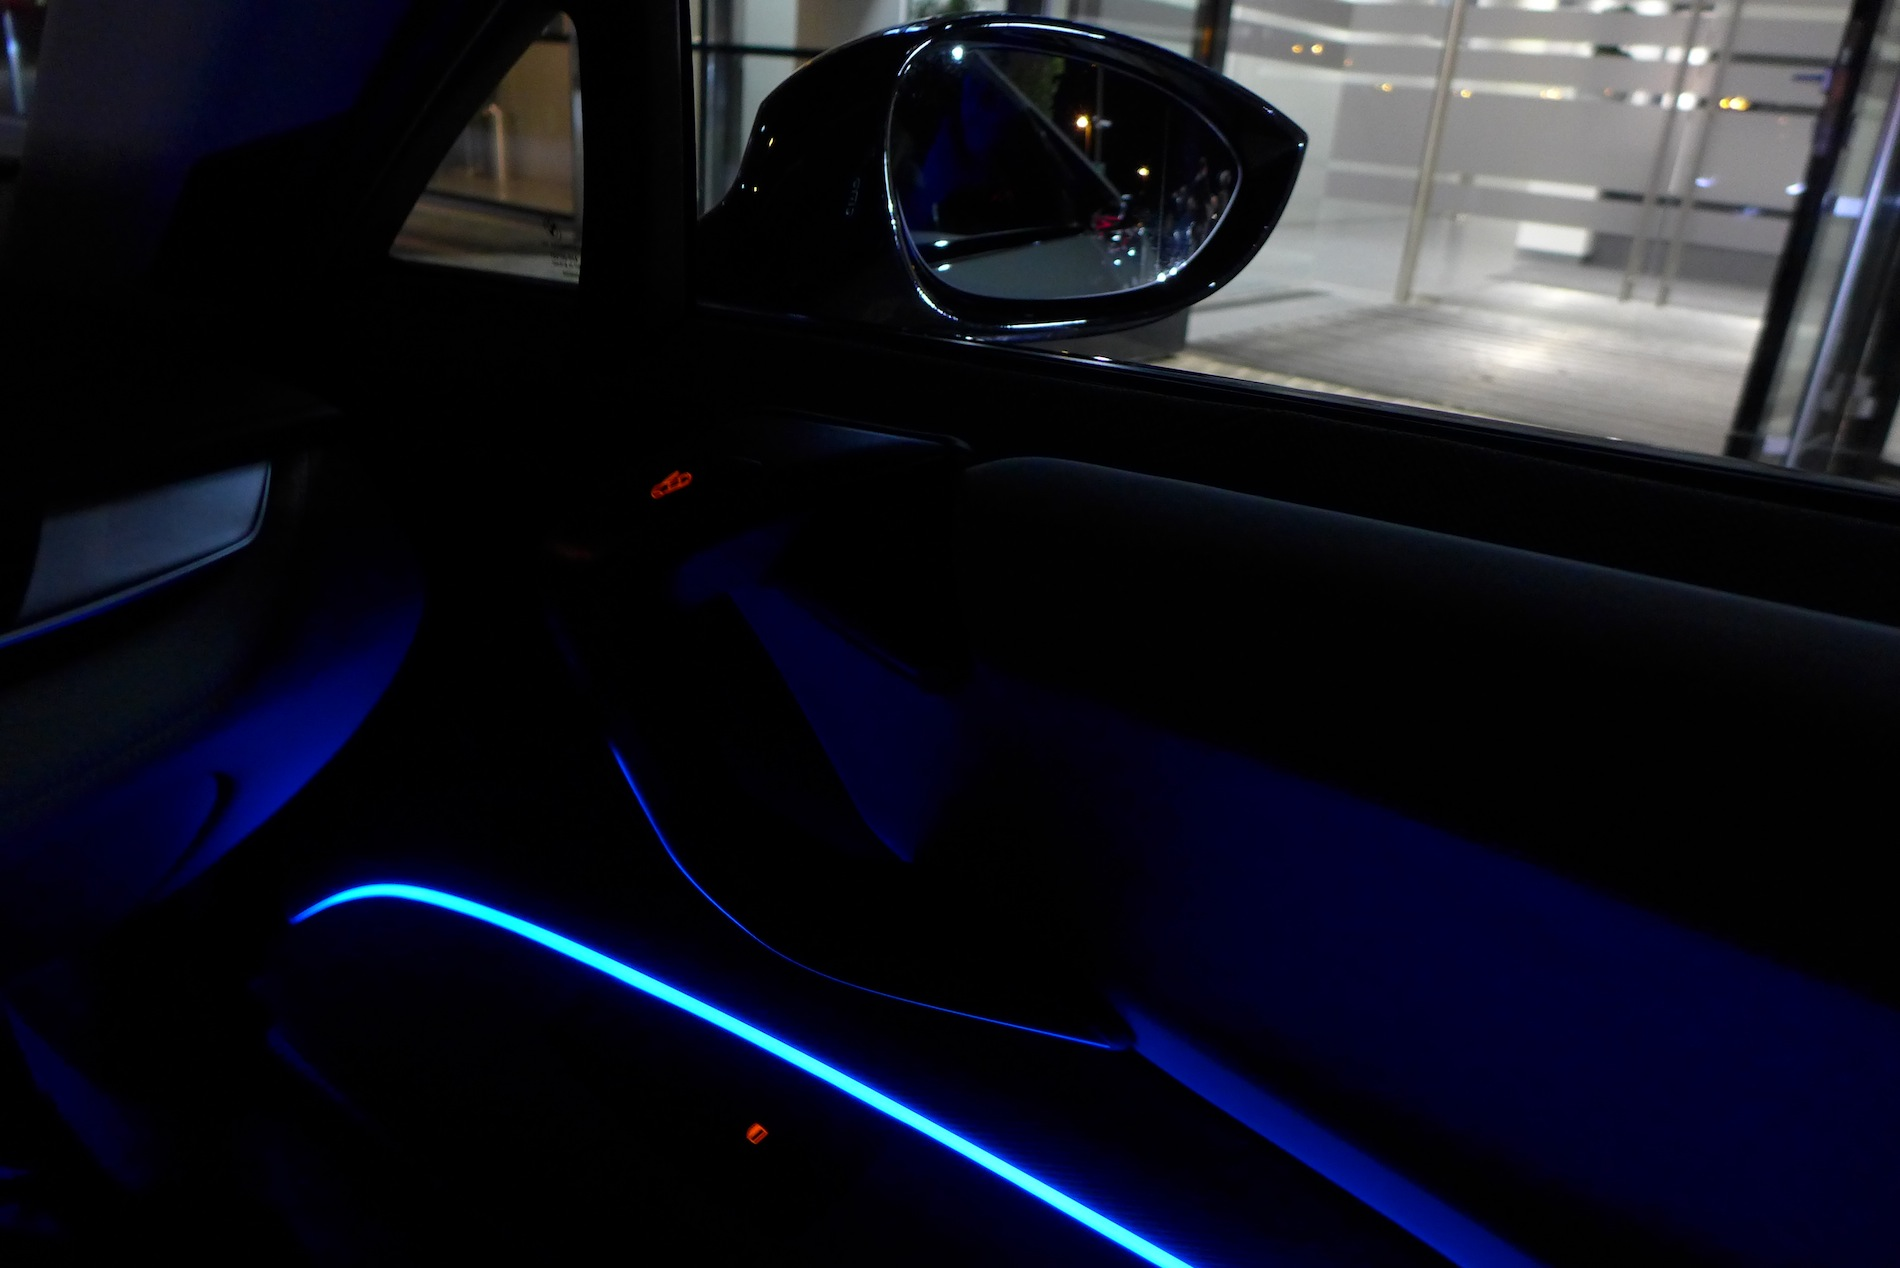 Matte Black BMW >> Photo Gallery: BMW i8 Interior at Night - autoevolution